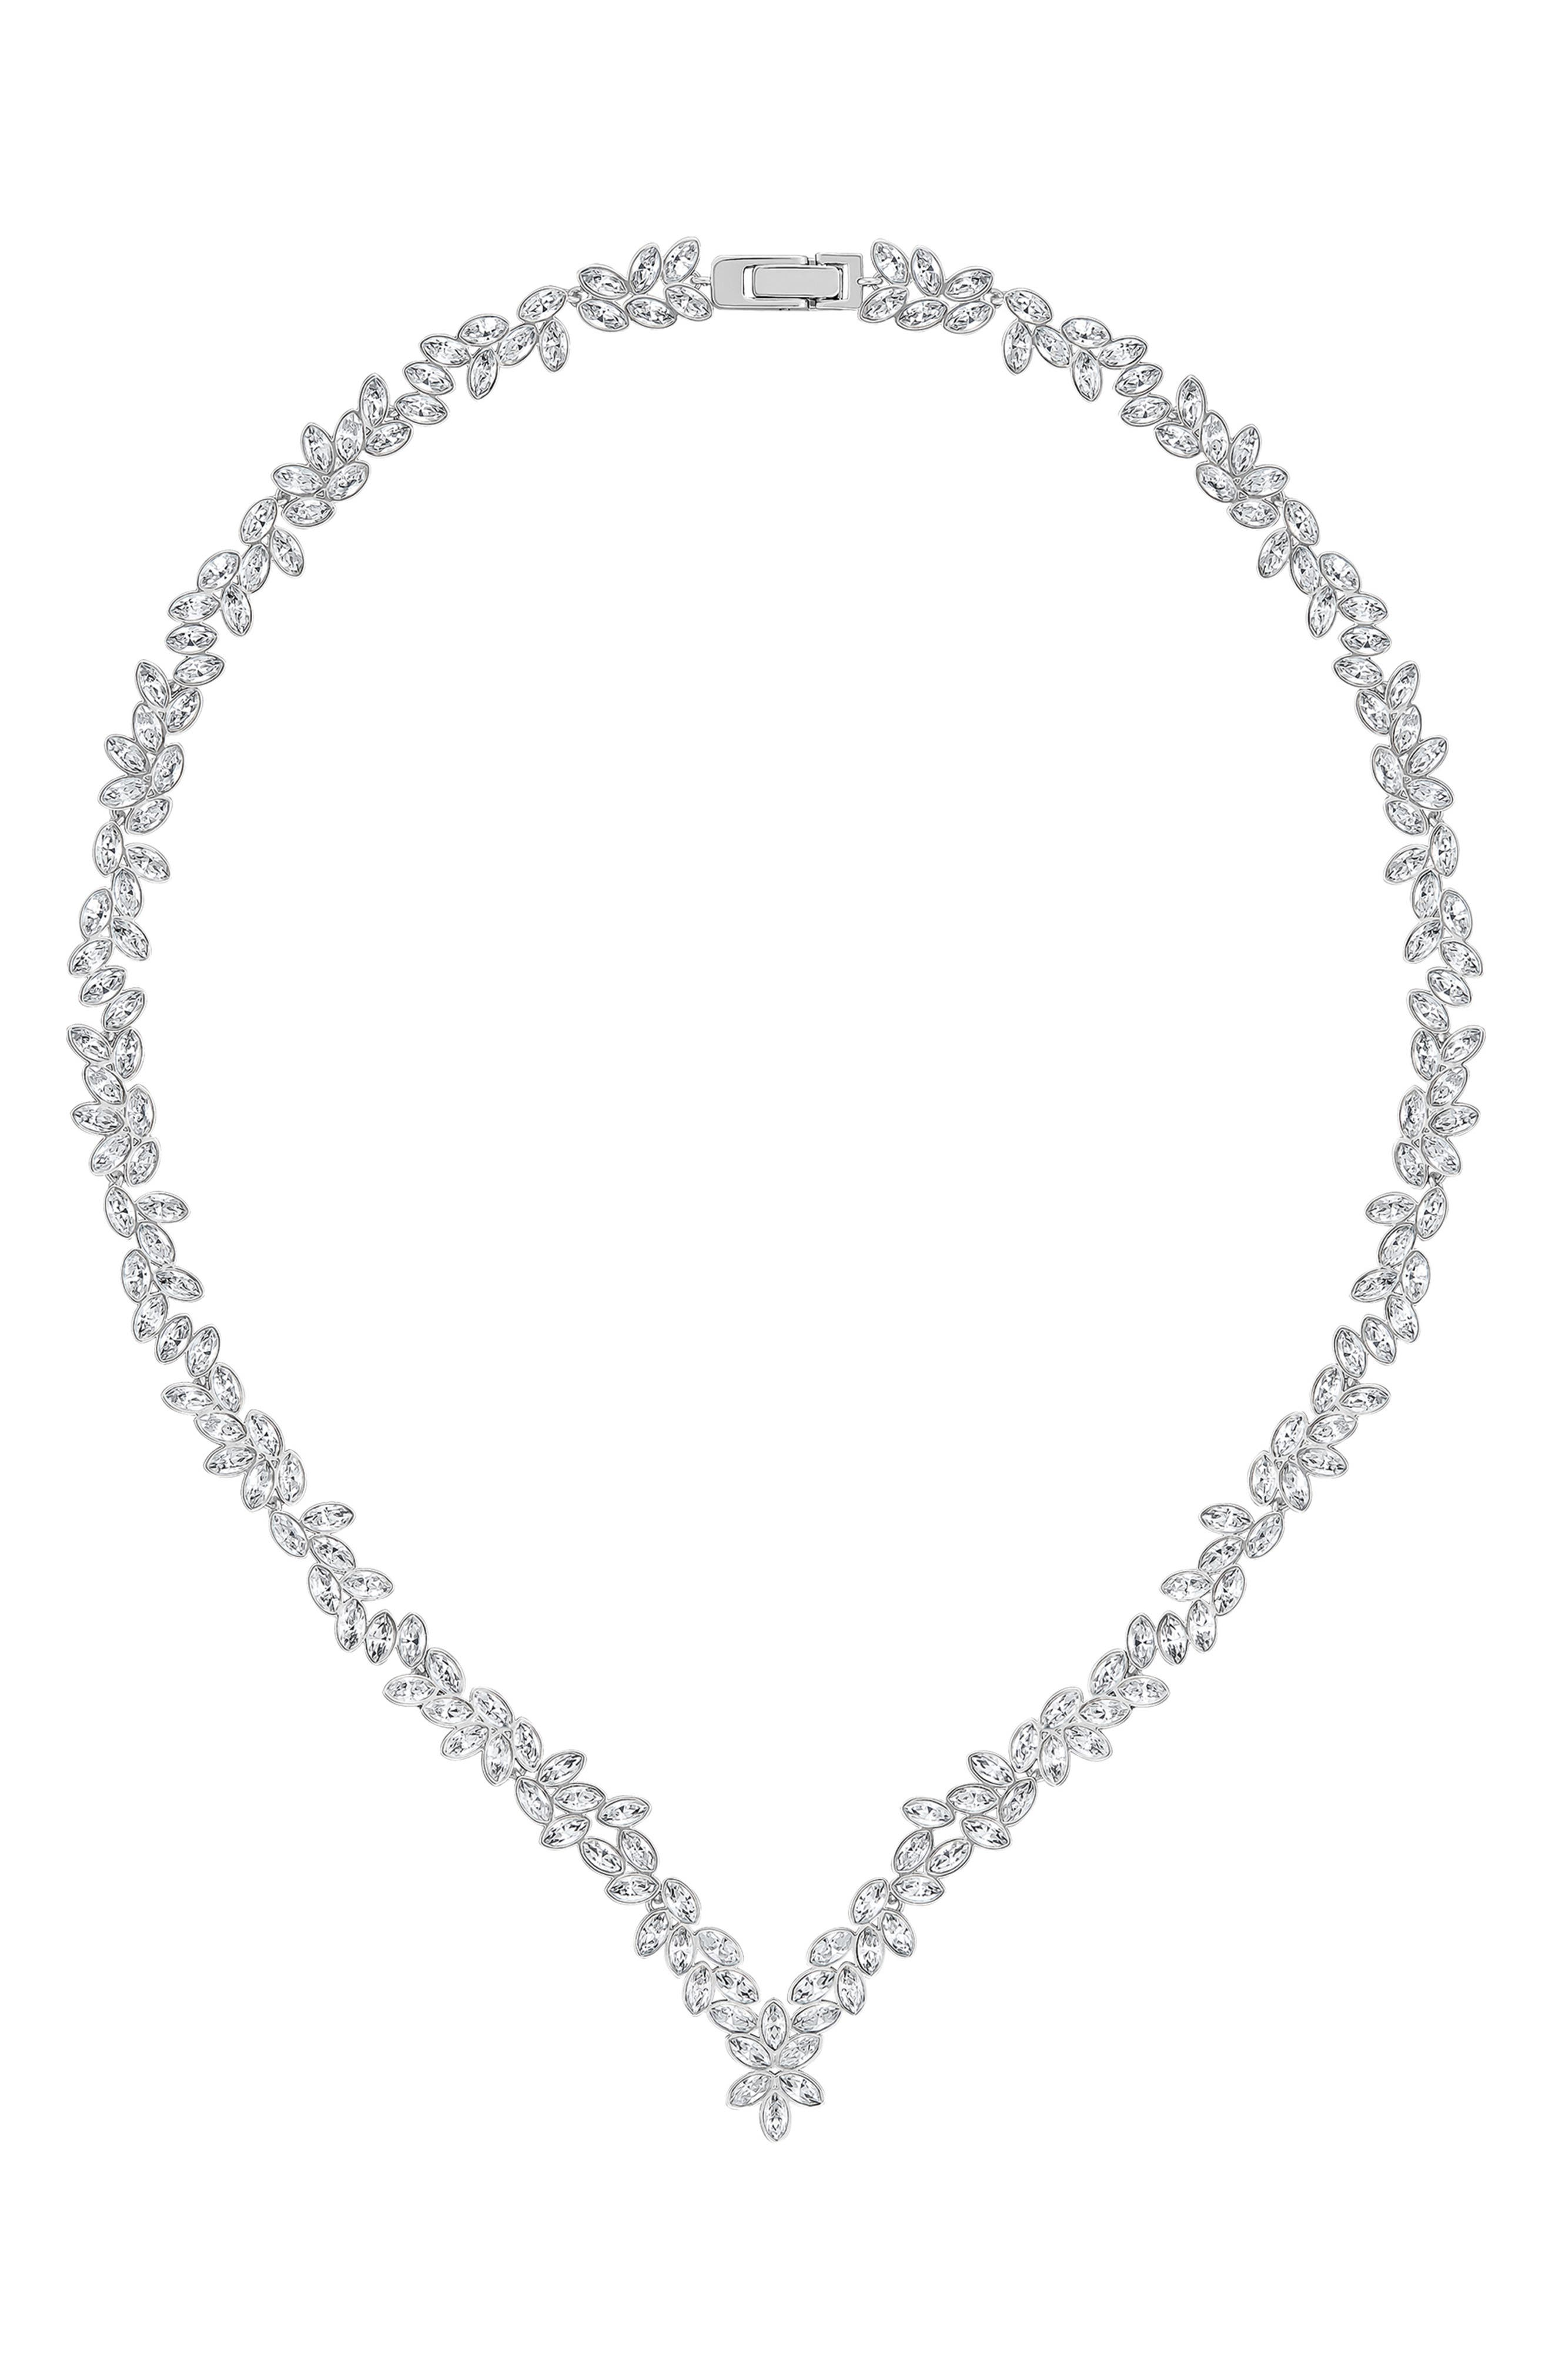 Image of Swarovski Diapasonall Rhodium Plated Swarovski Crystal V Collar Necklace